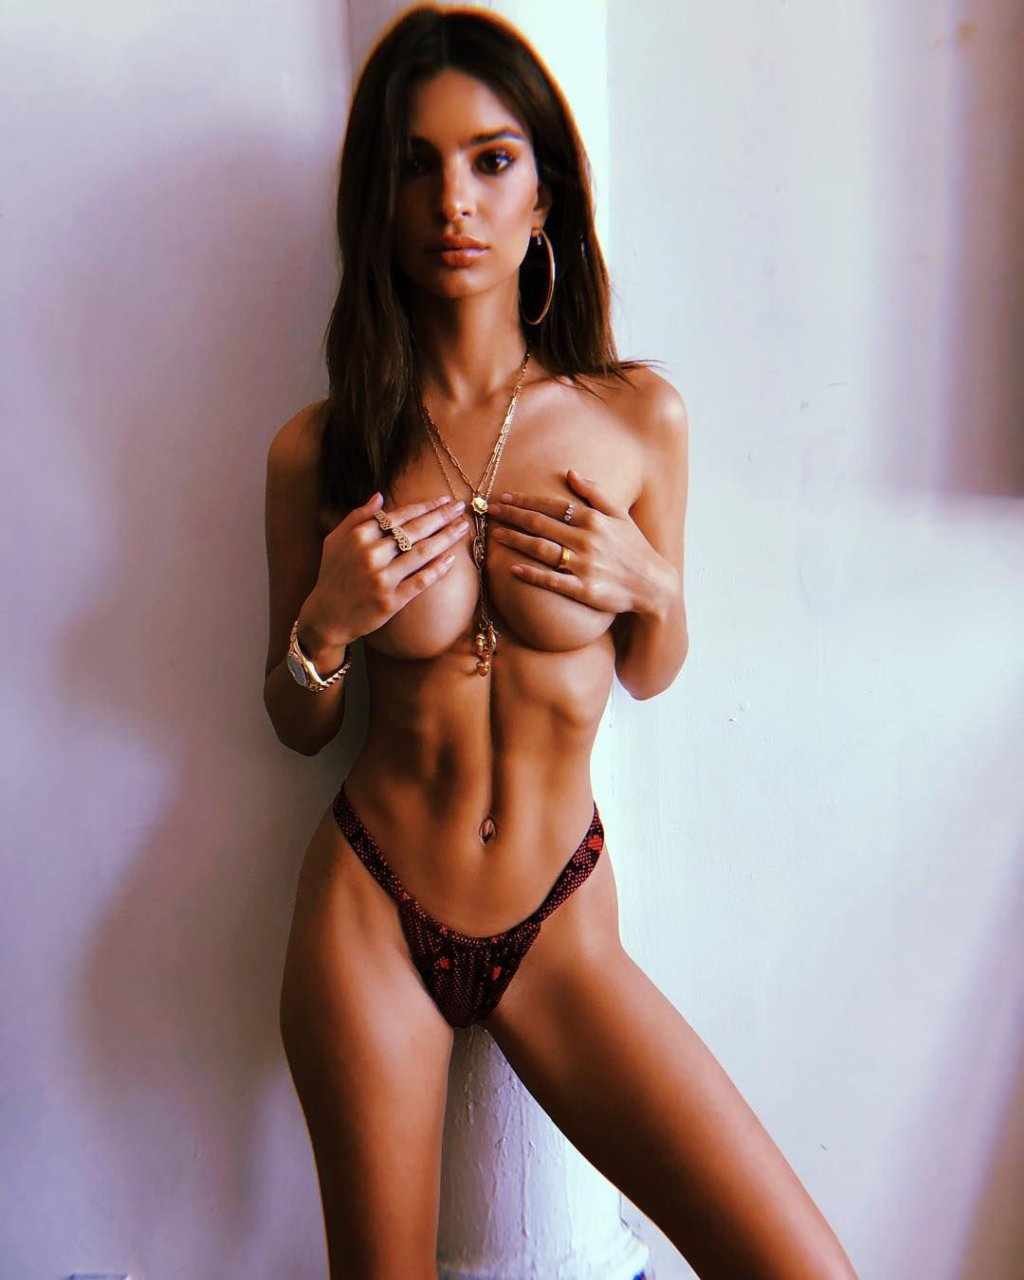 Naked models instagram